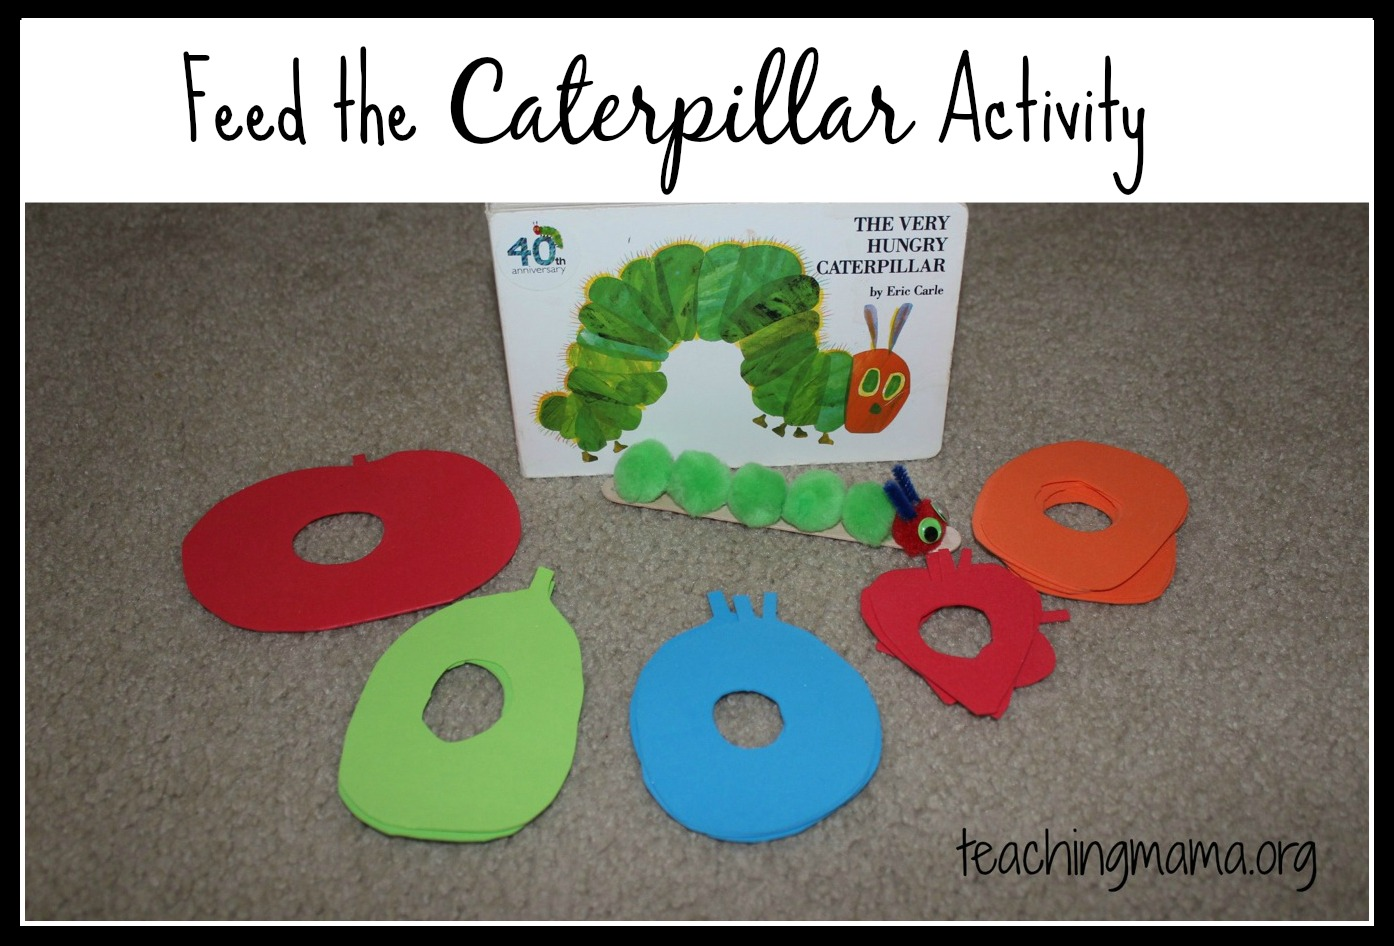 Feed The Caterpillar Activity